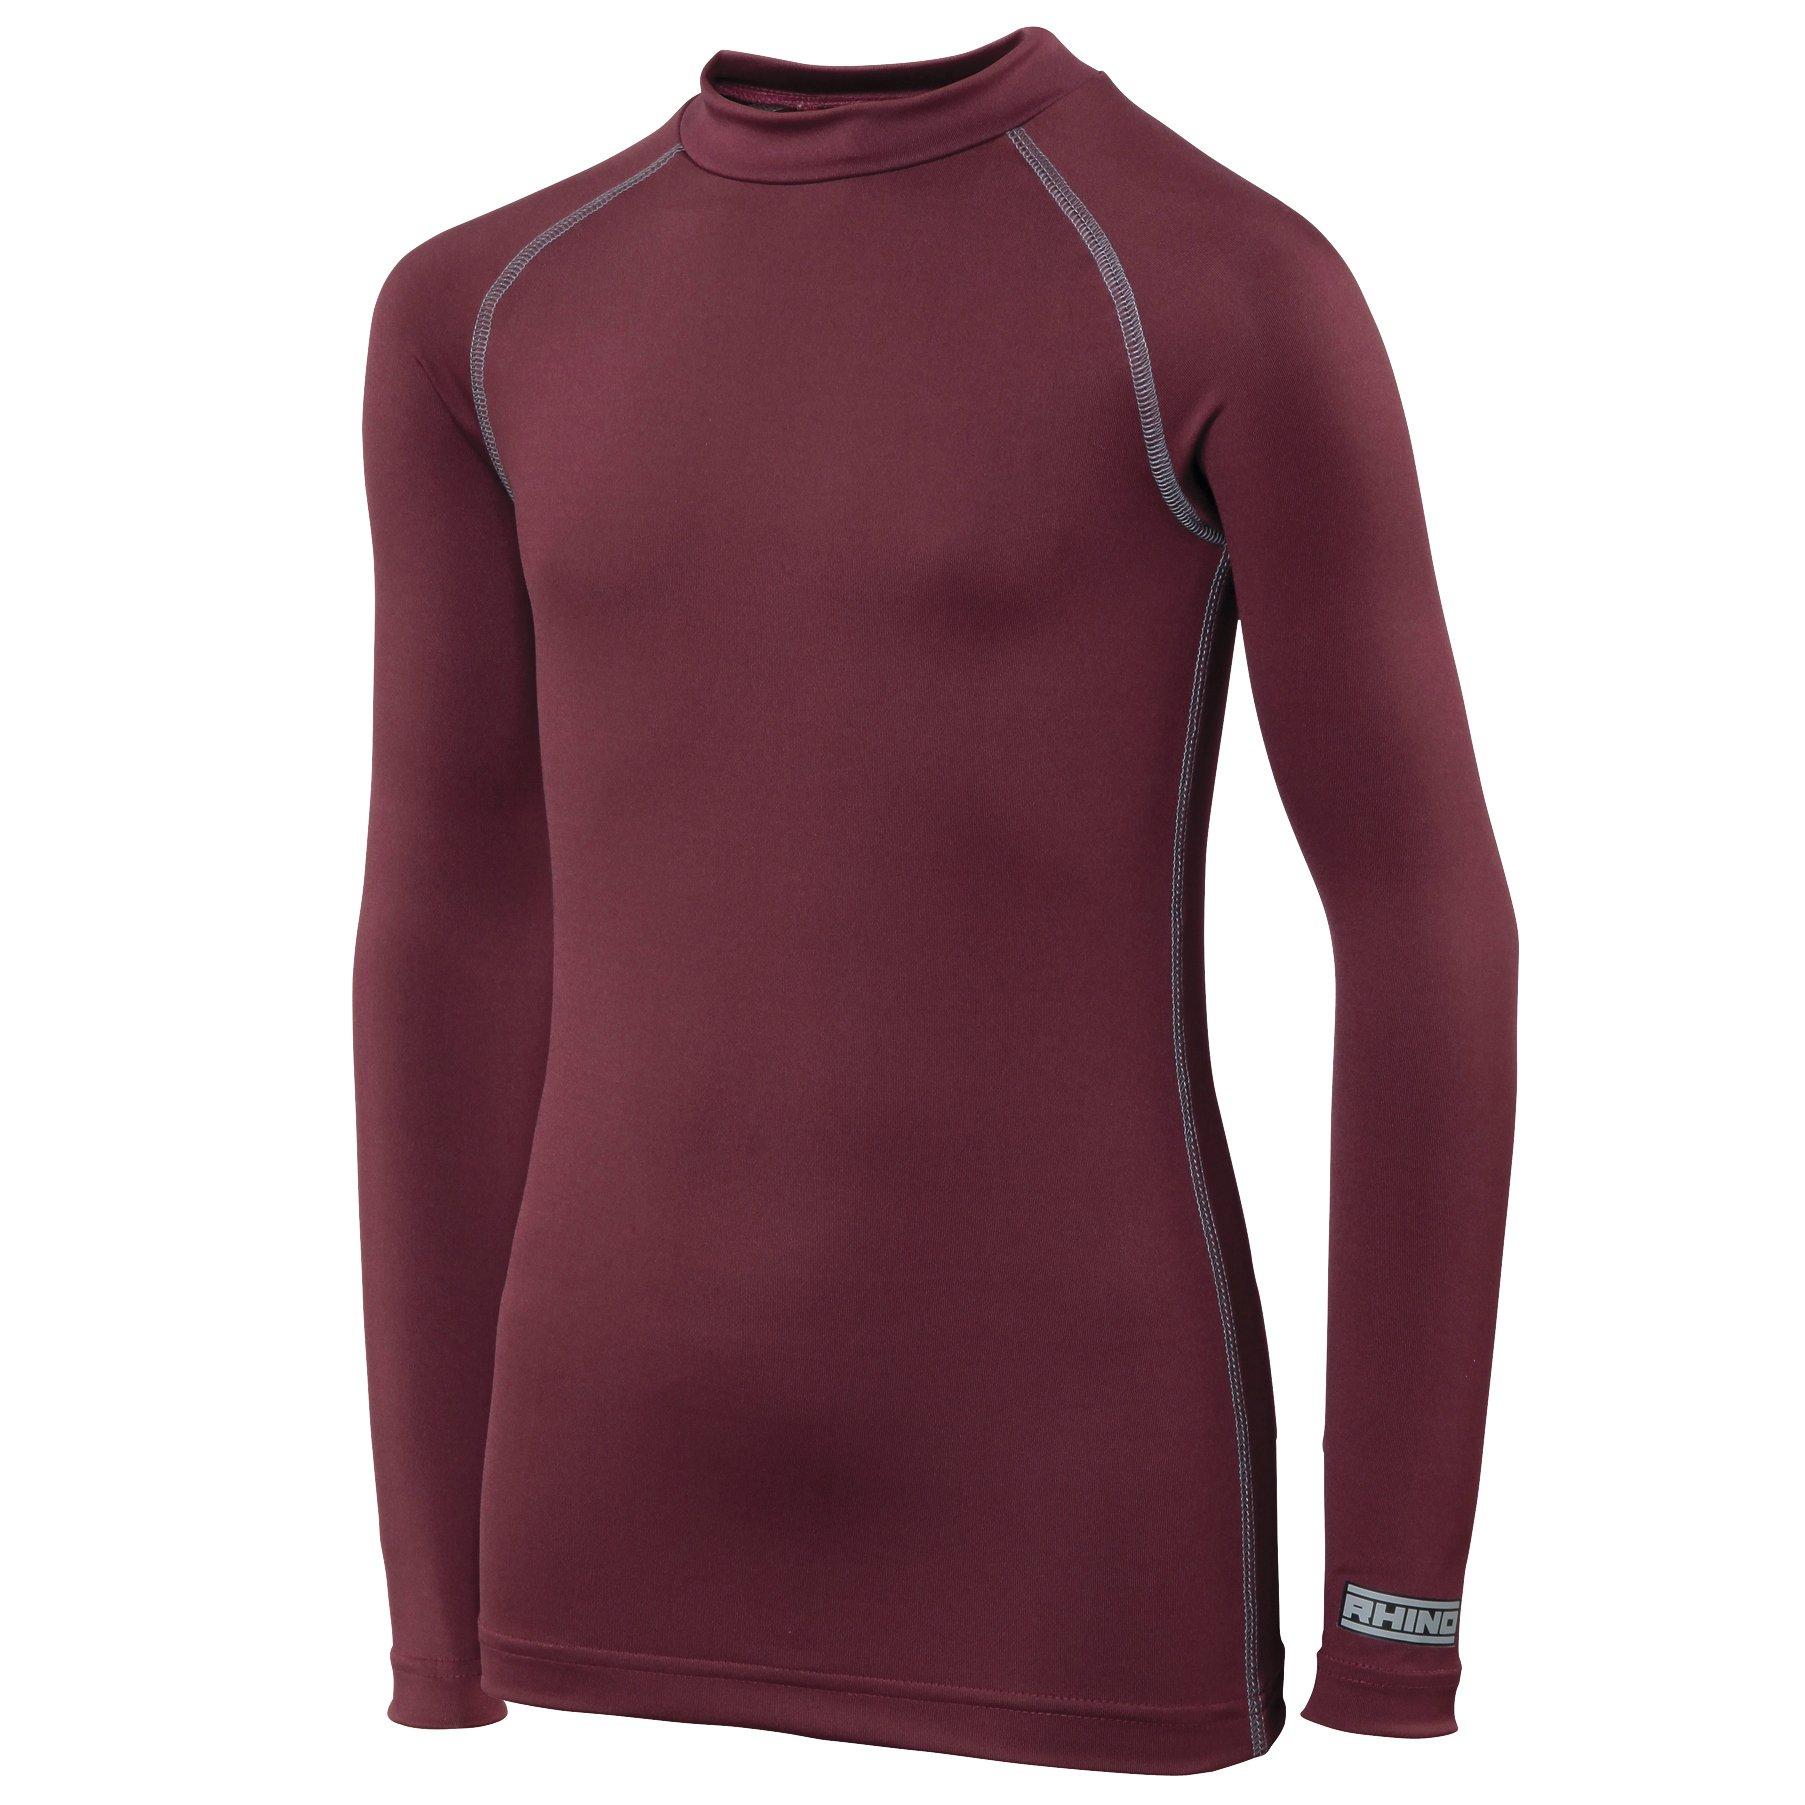 Rhino Childrens Big Boys Long Sleeve Thermal Underwear Base Layer Vest Top (LY-XLY) (Maroon) by Rhino